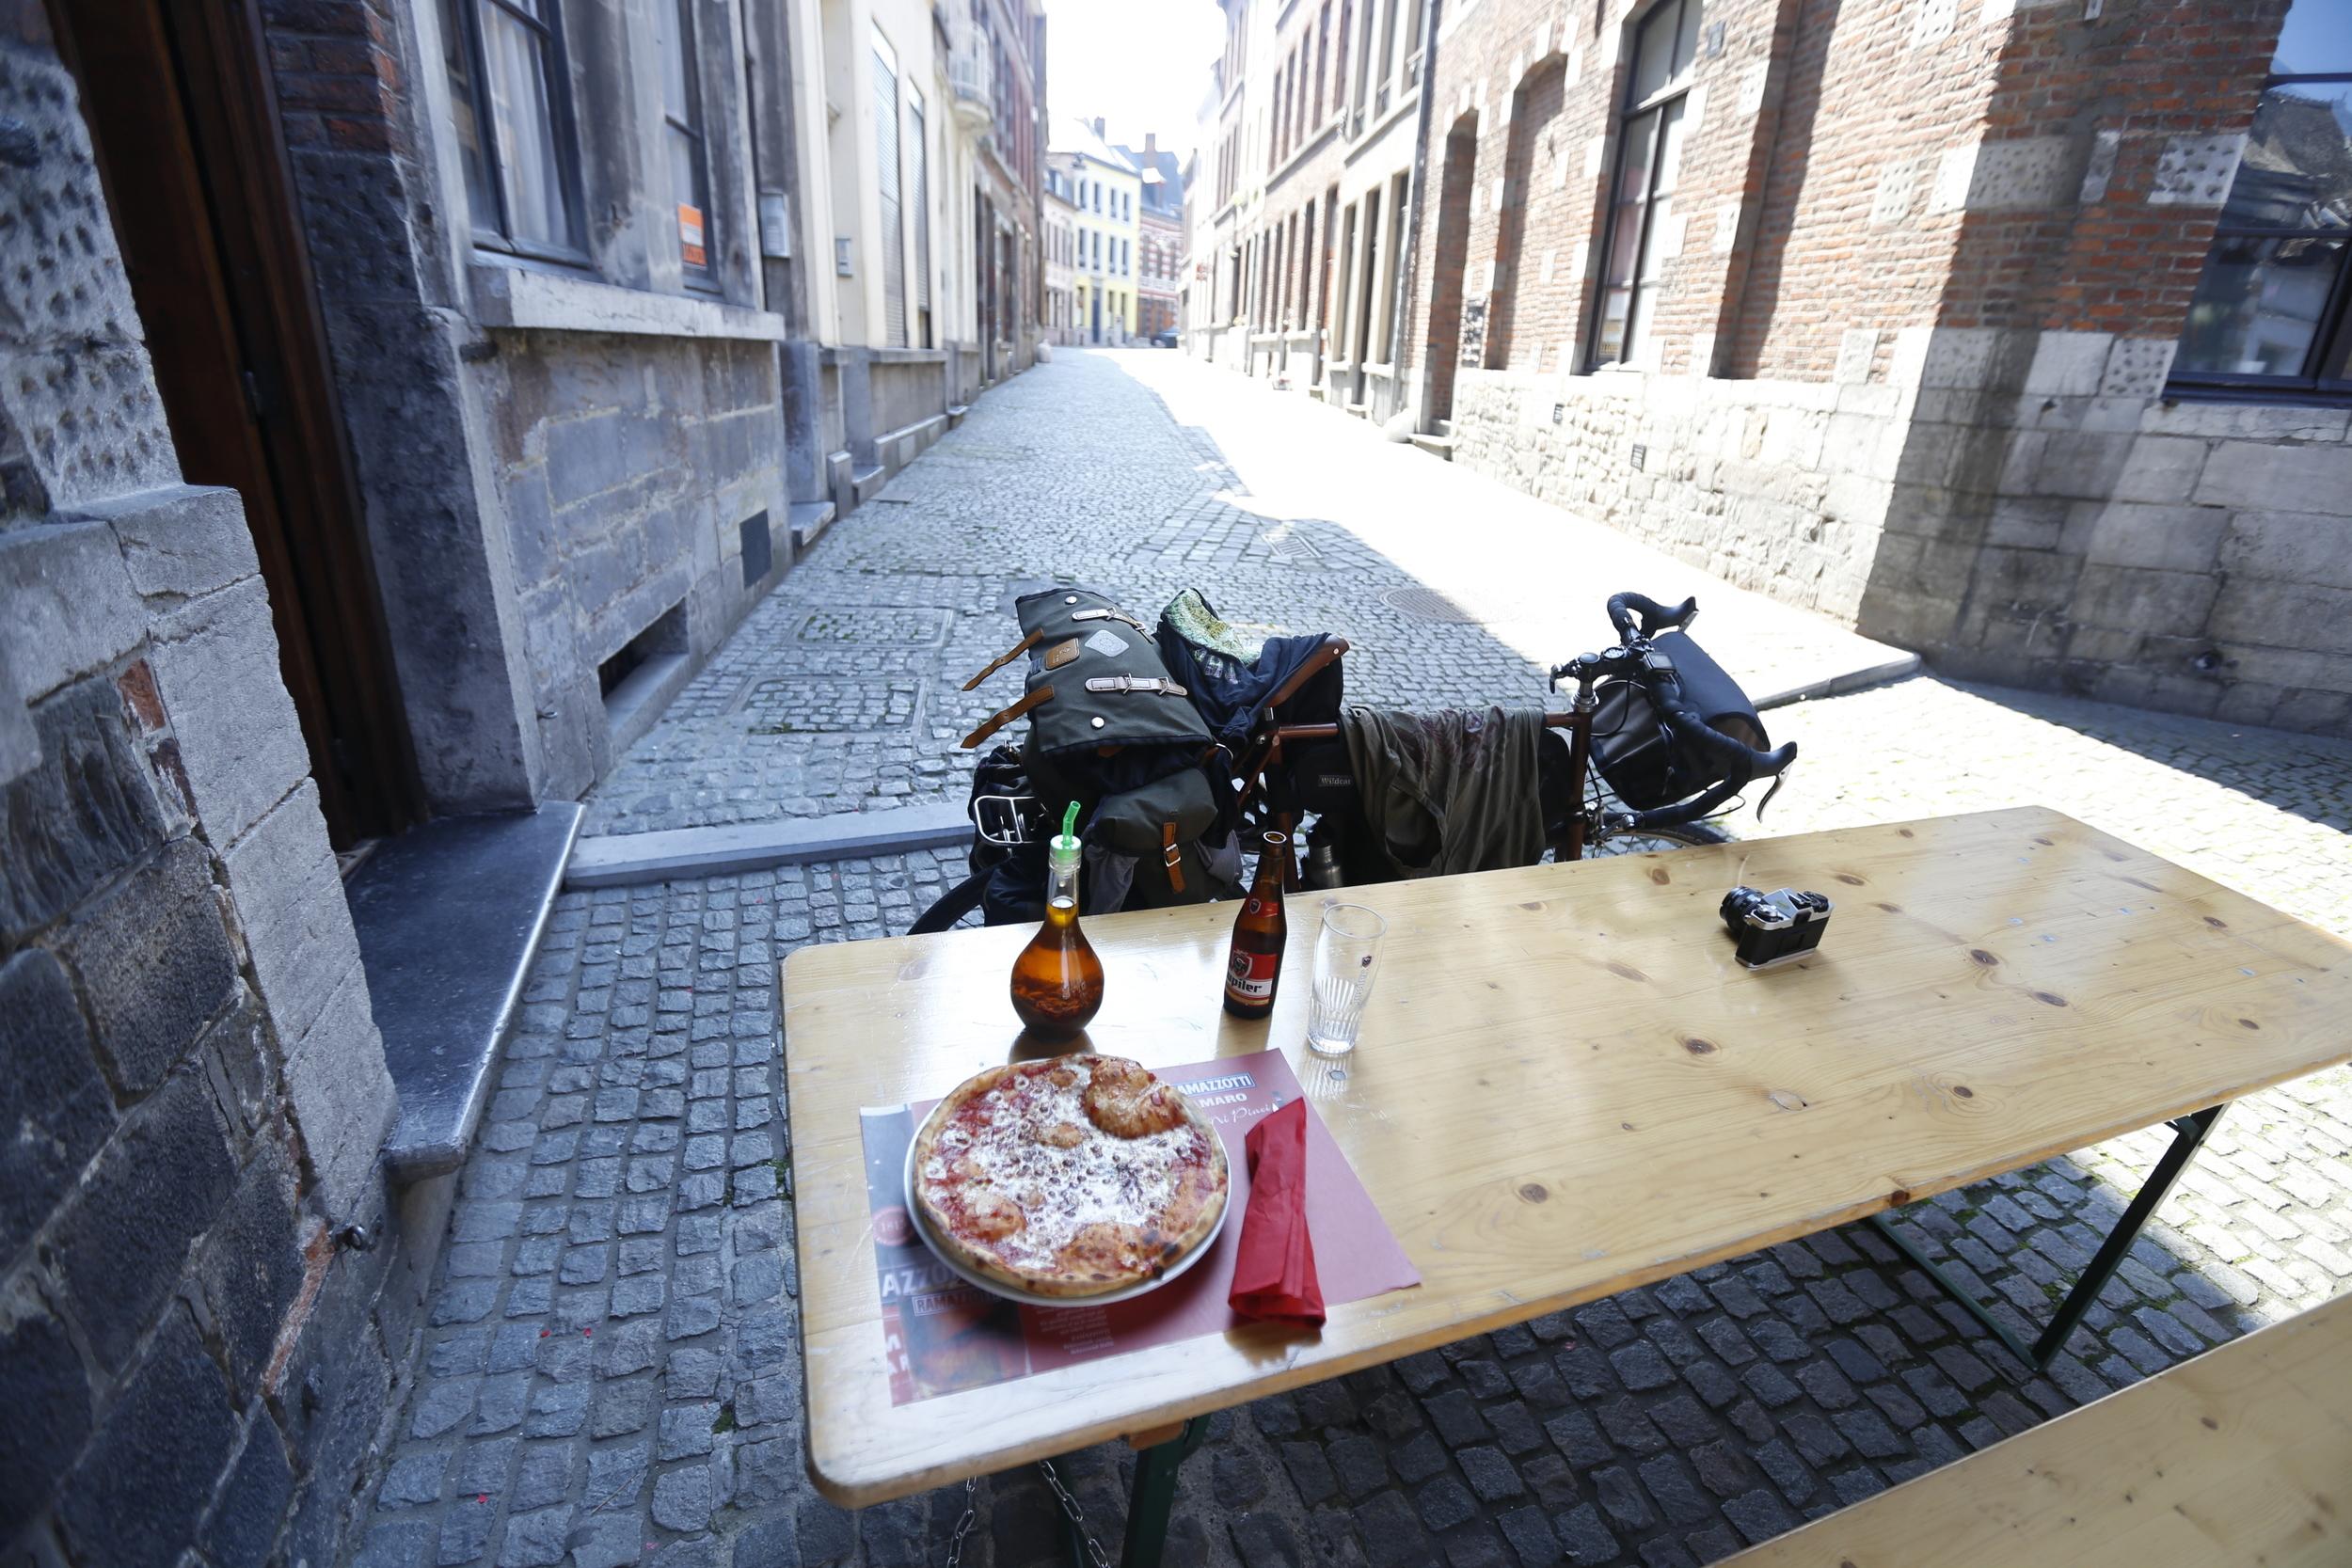 pizza, food, italian pizza, foodie, food blog, bikepacking food, cycle touring food, bikepacking beer, beer, ipa, local, brewery, photography, photography blog, bikepacking, bikepacking blog, bicycle touring apocalypse, cycling, taste, recipe, italy, italian, visit belgium, mons, visit mons, custom bike, custom tourer, touring bicycle, bikepacking bike